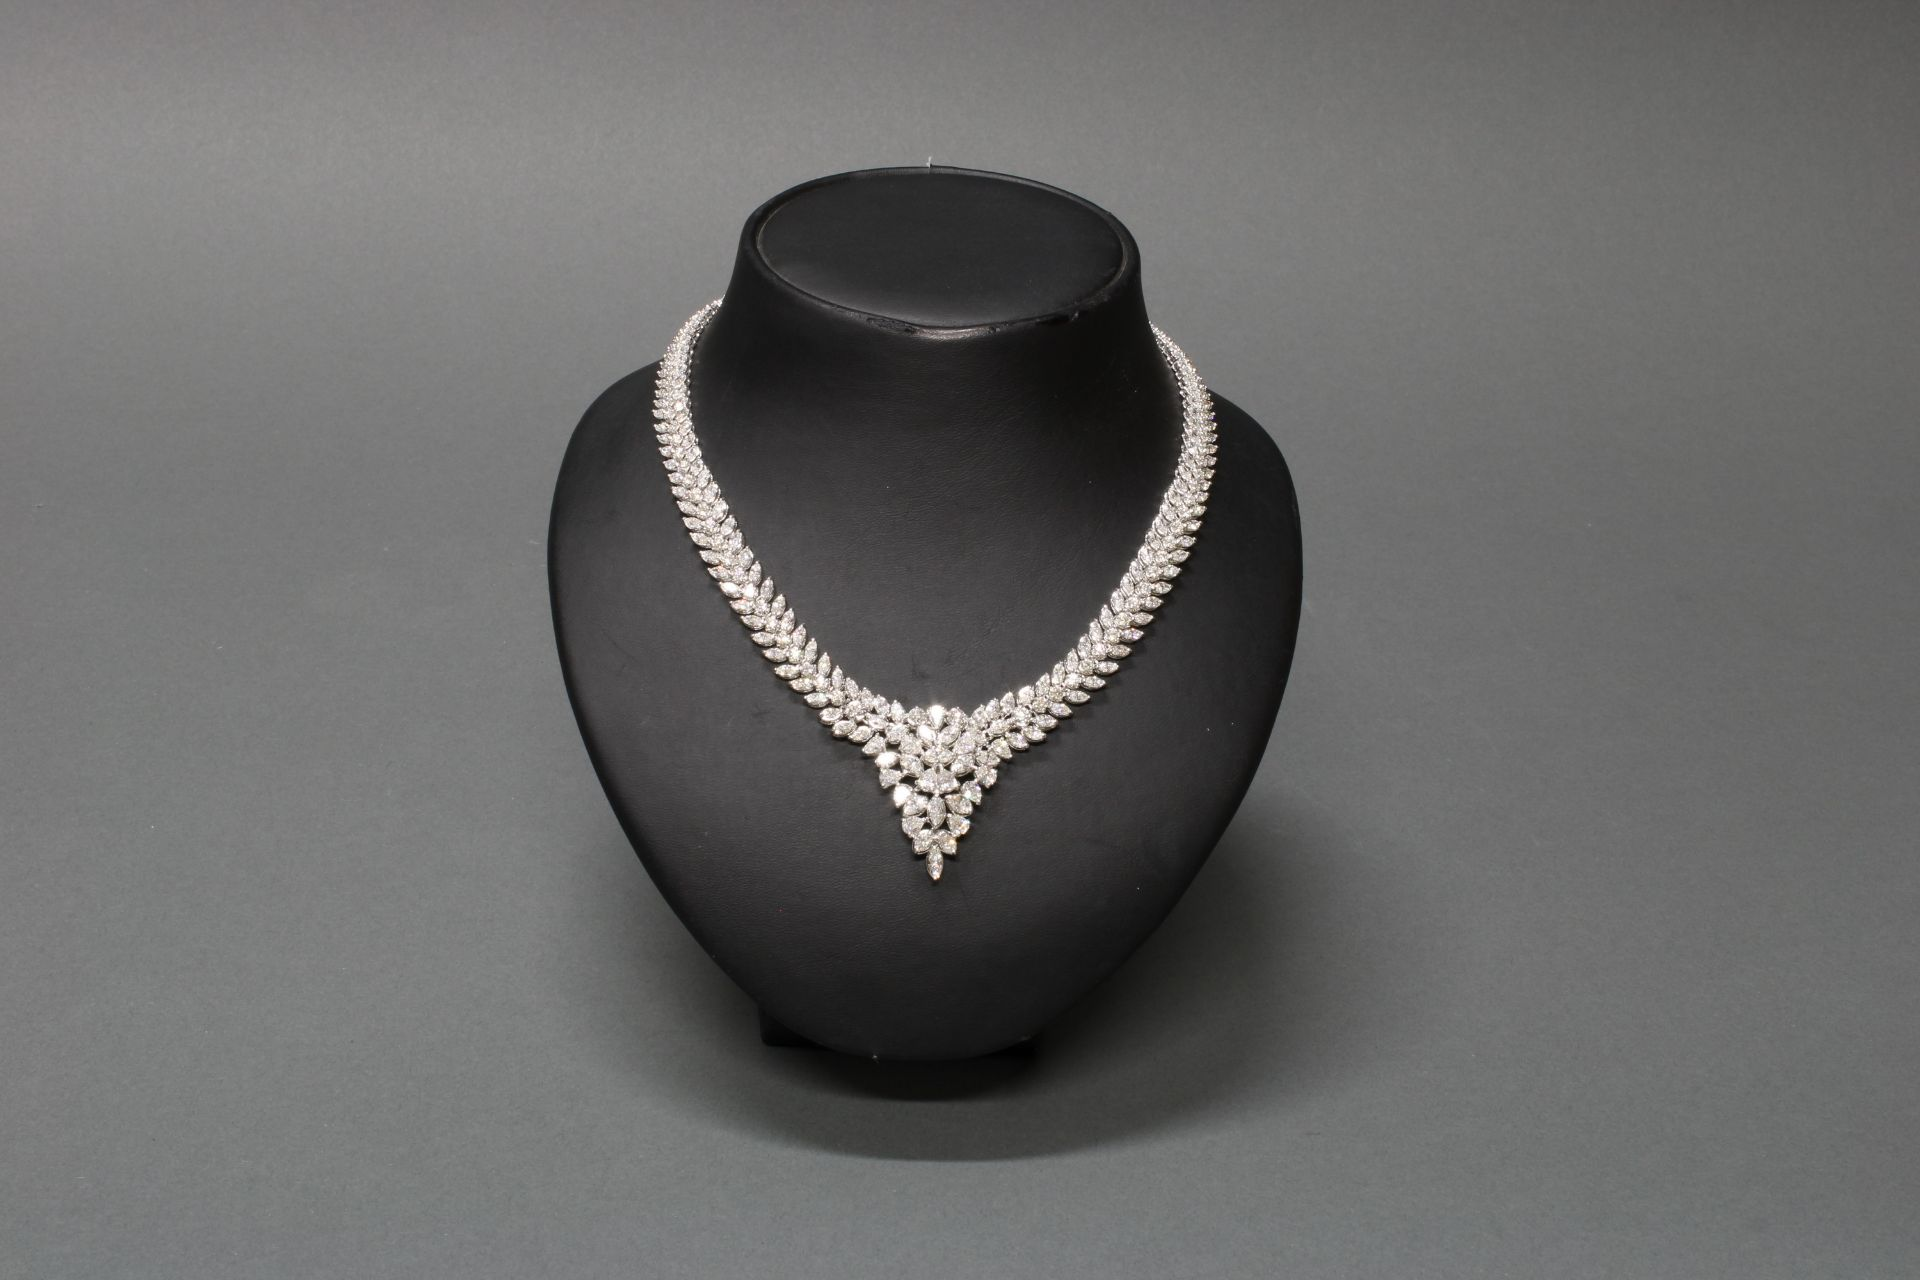 Collier, Atelier J.P. CAM, Fine Jewelery, Hongkong, WG 750, ca. 19.05 ct. - Bild 2 aus 4